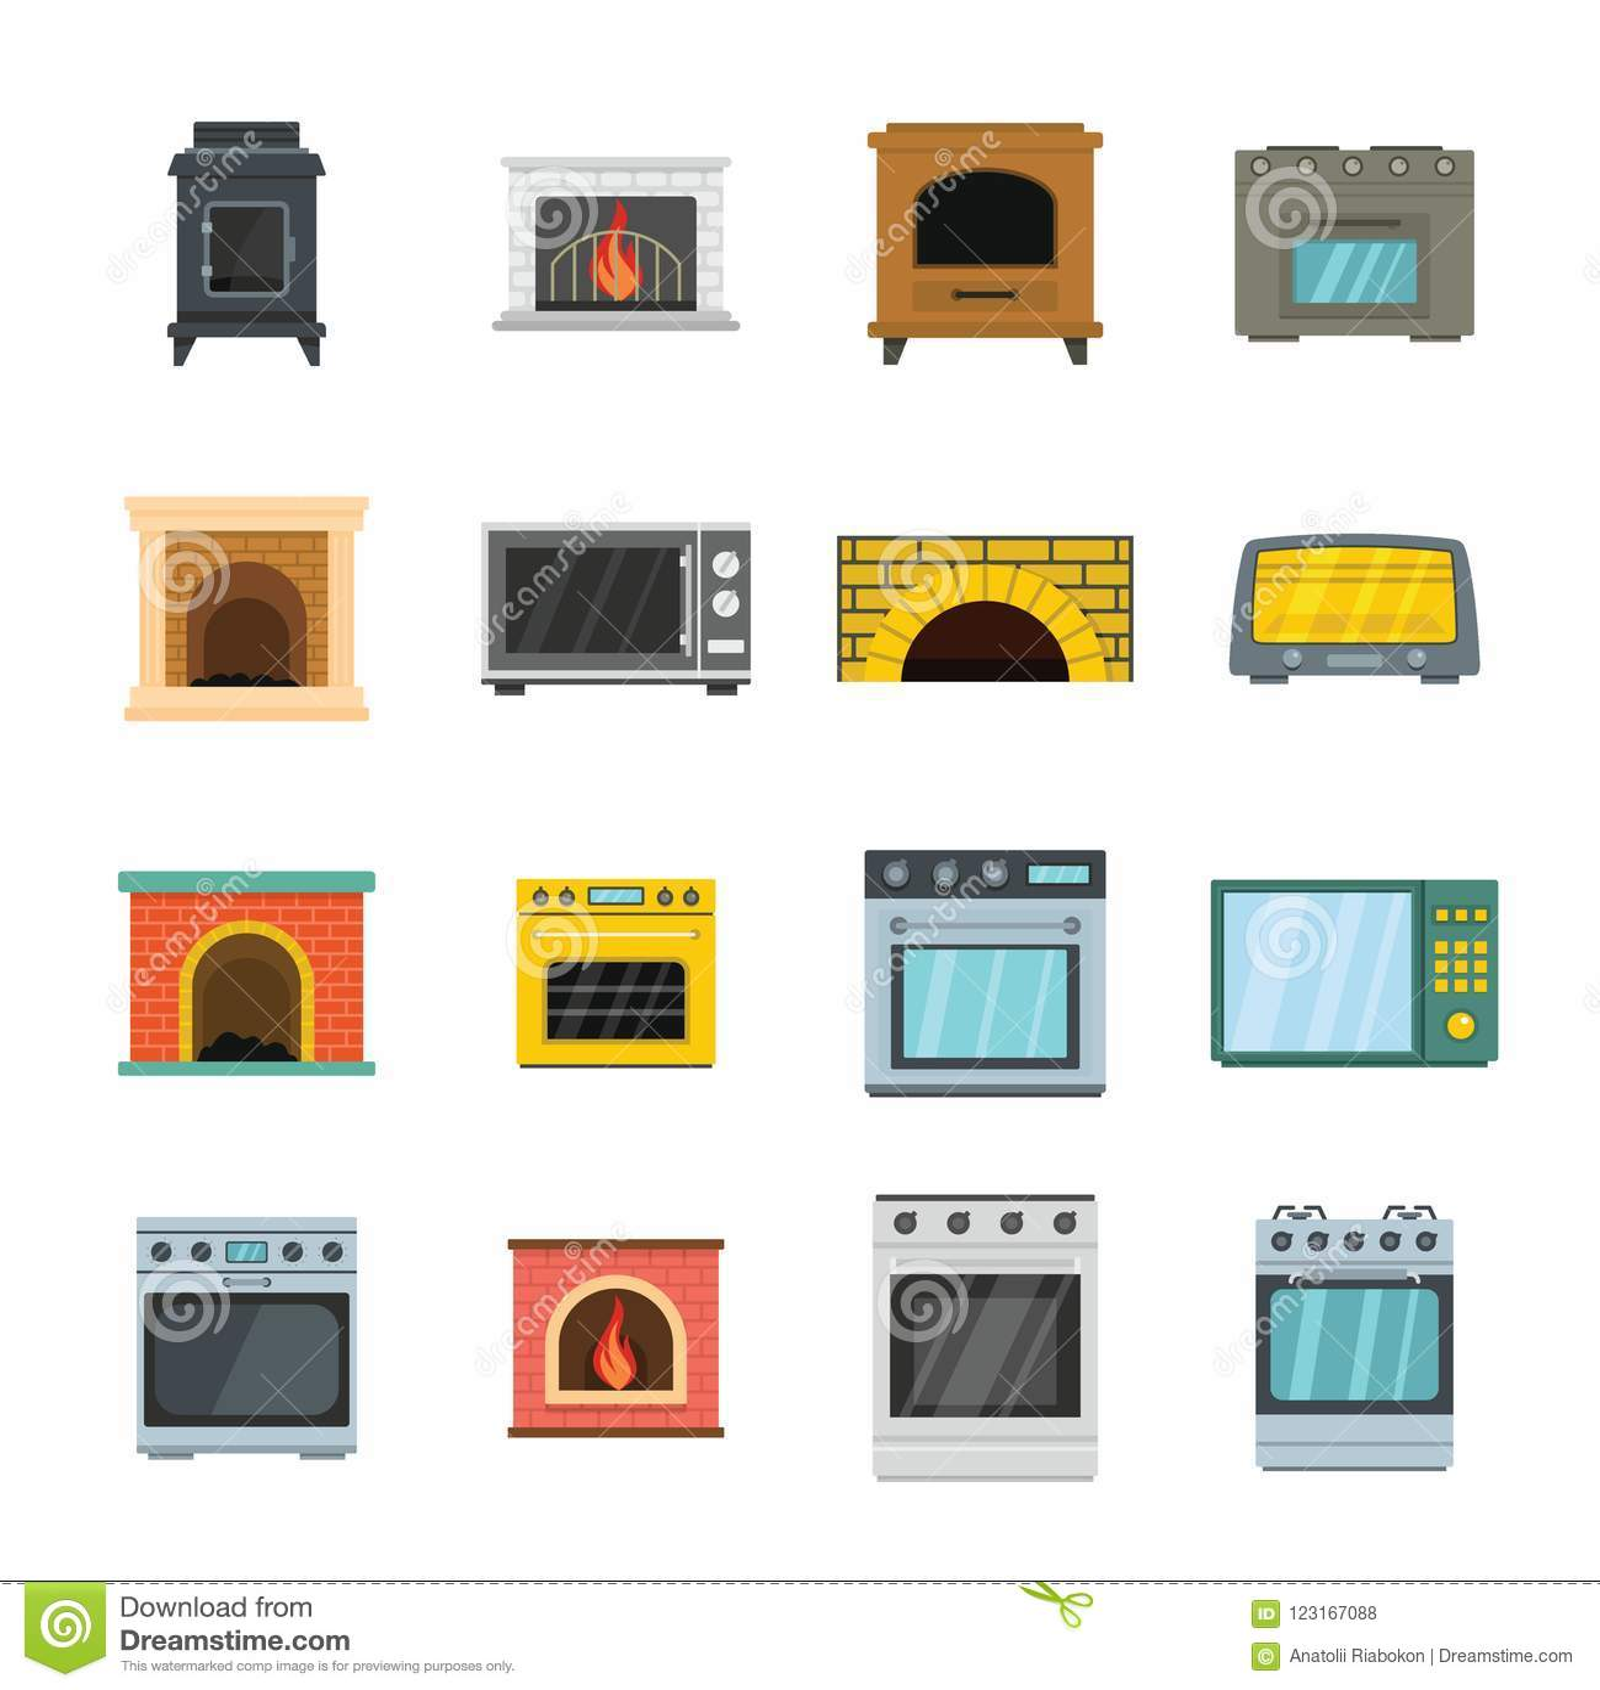 Los iconos de la chimenea del horno de la estufa del horno fijaron, estilo plano